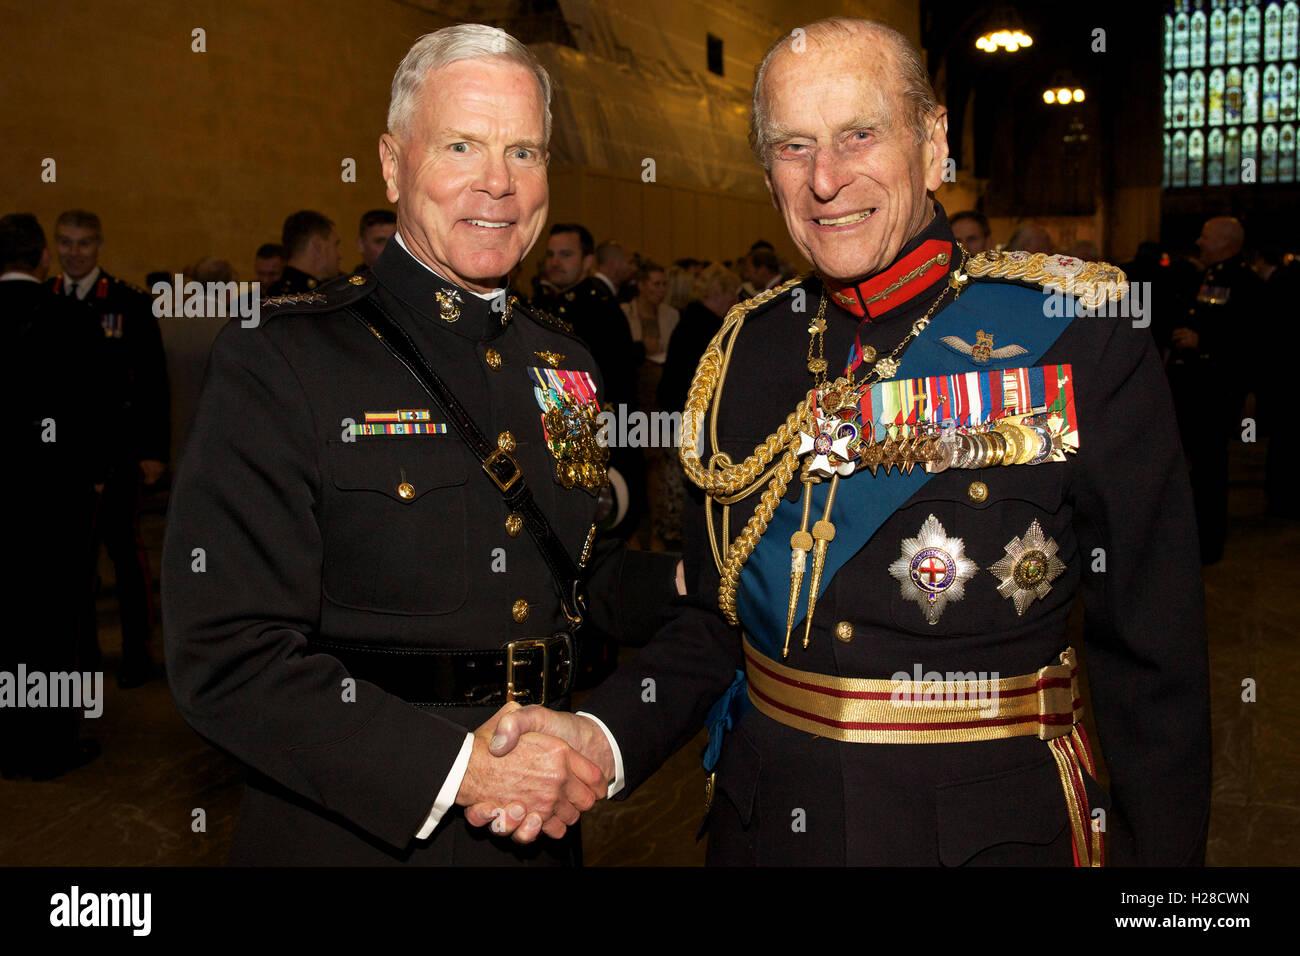 u s marine corps commandant general james f amos with the duke of stock photo 121887633 alamy. Black Bedroom Furniture Sets. Home Design Ideas